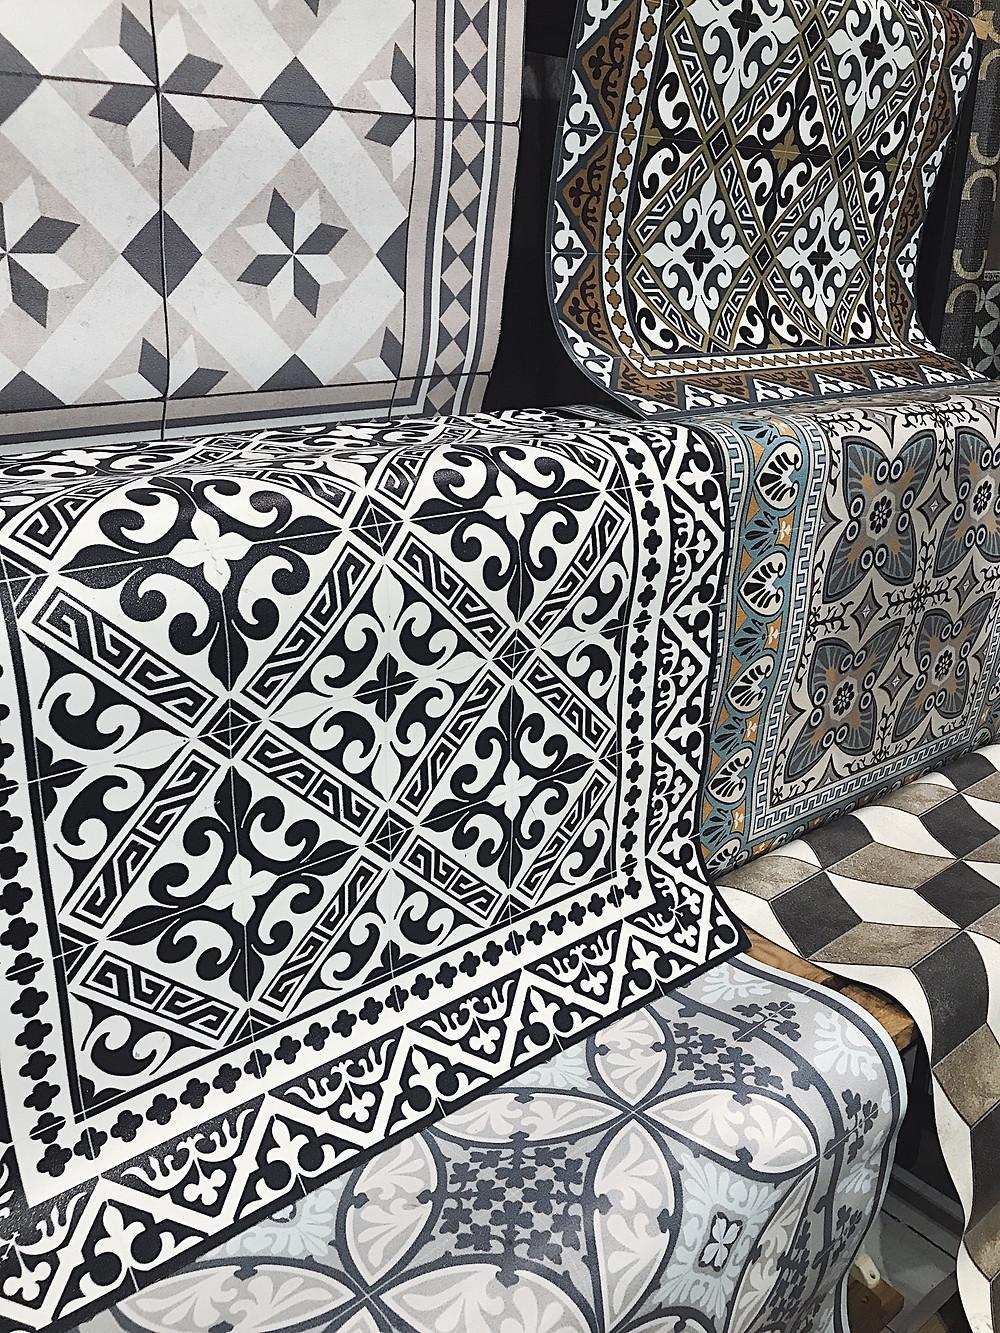 Bejia Fior handmade floor tiles and rugs